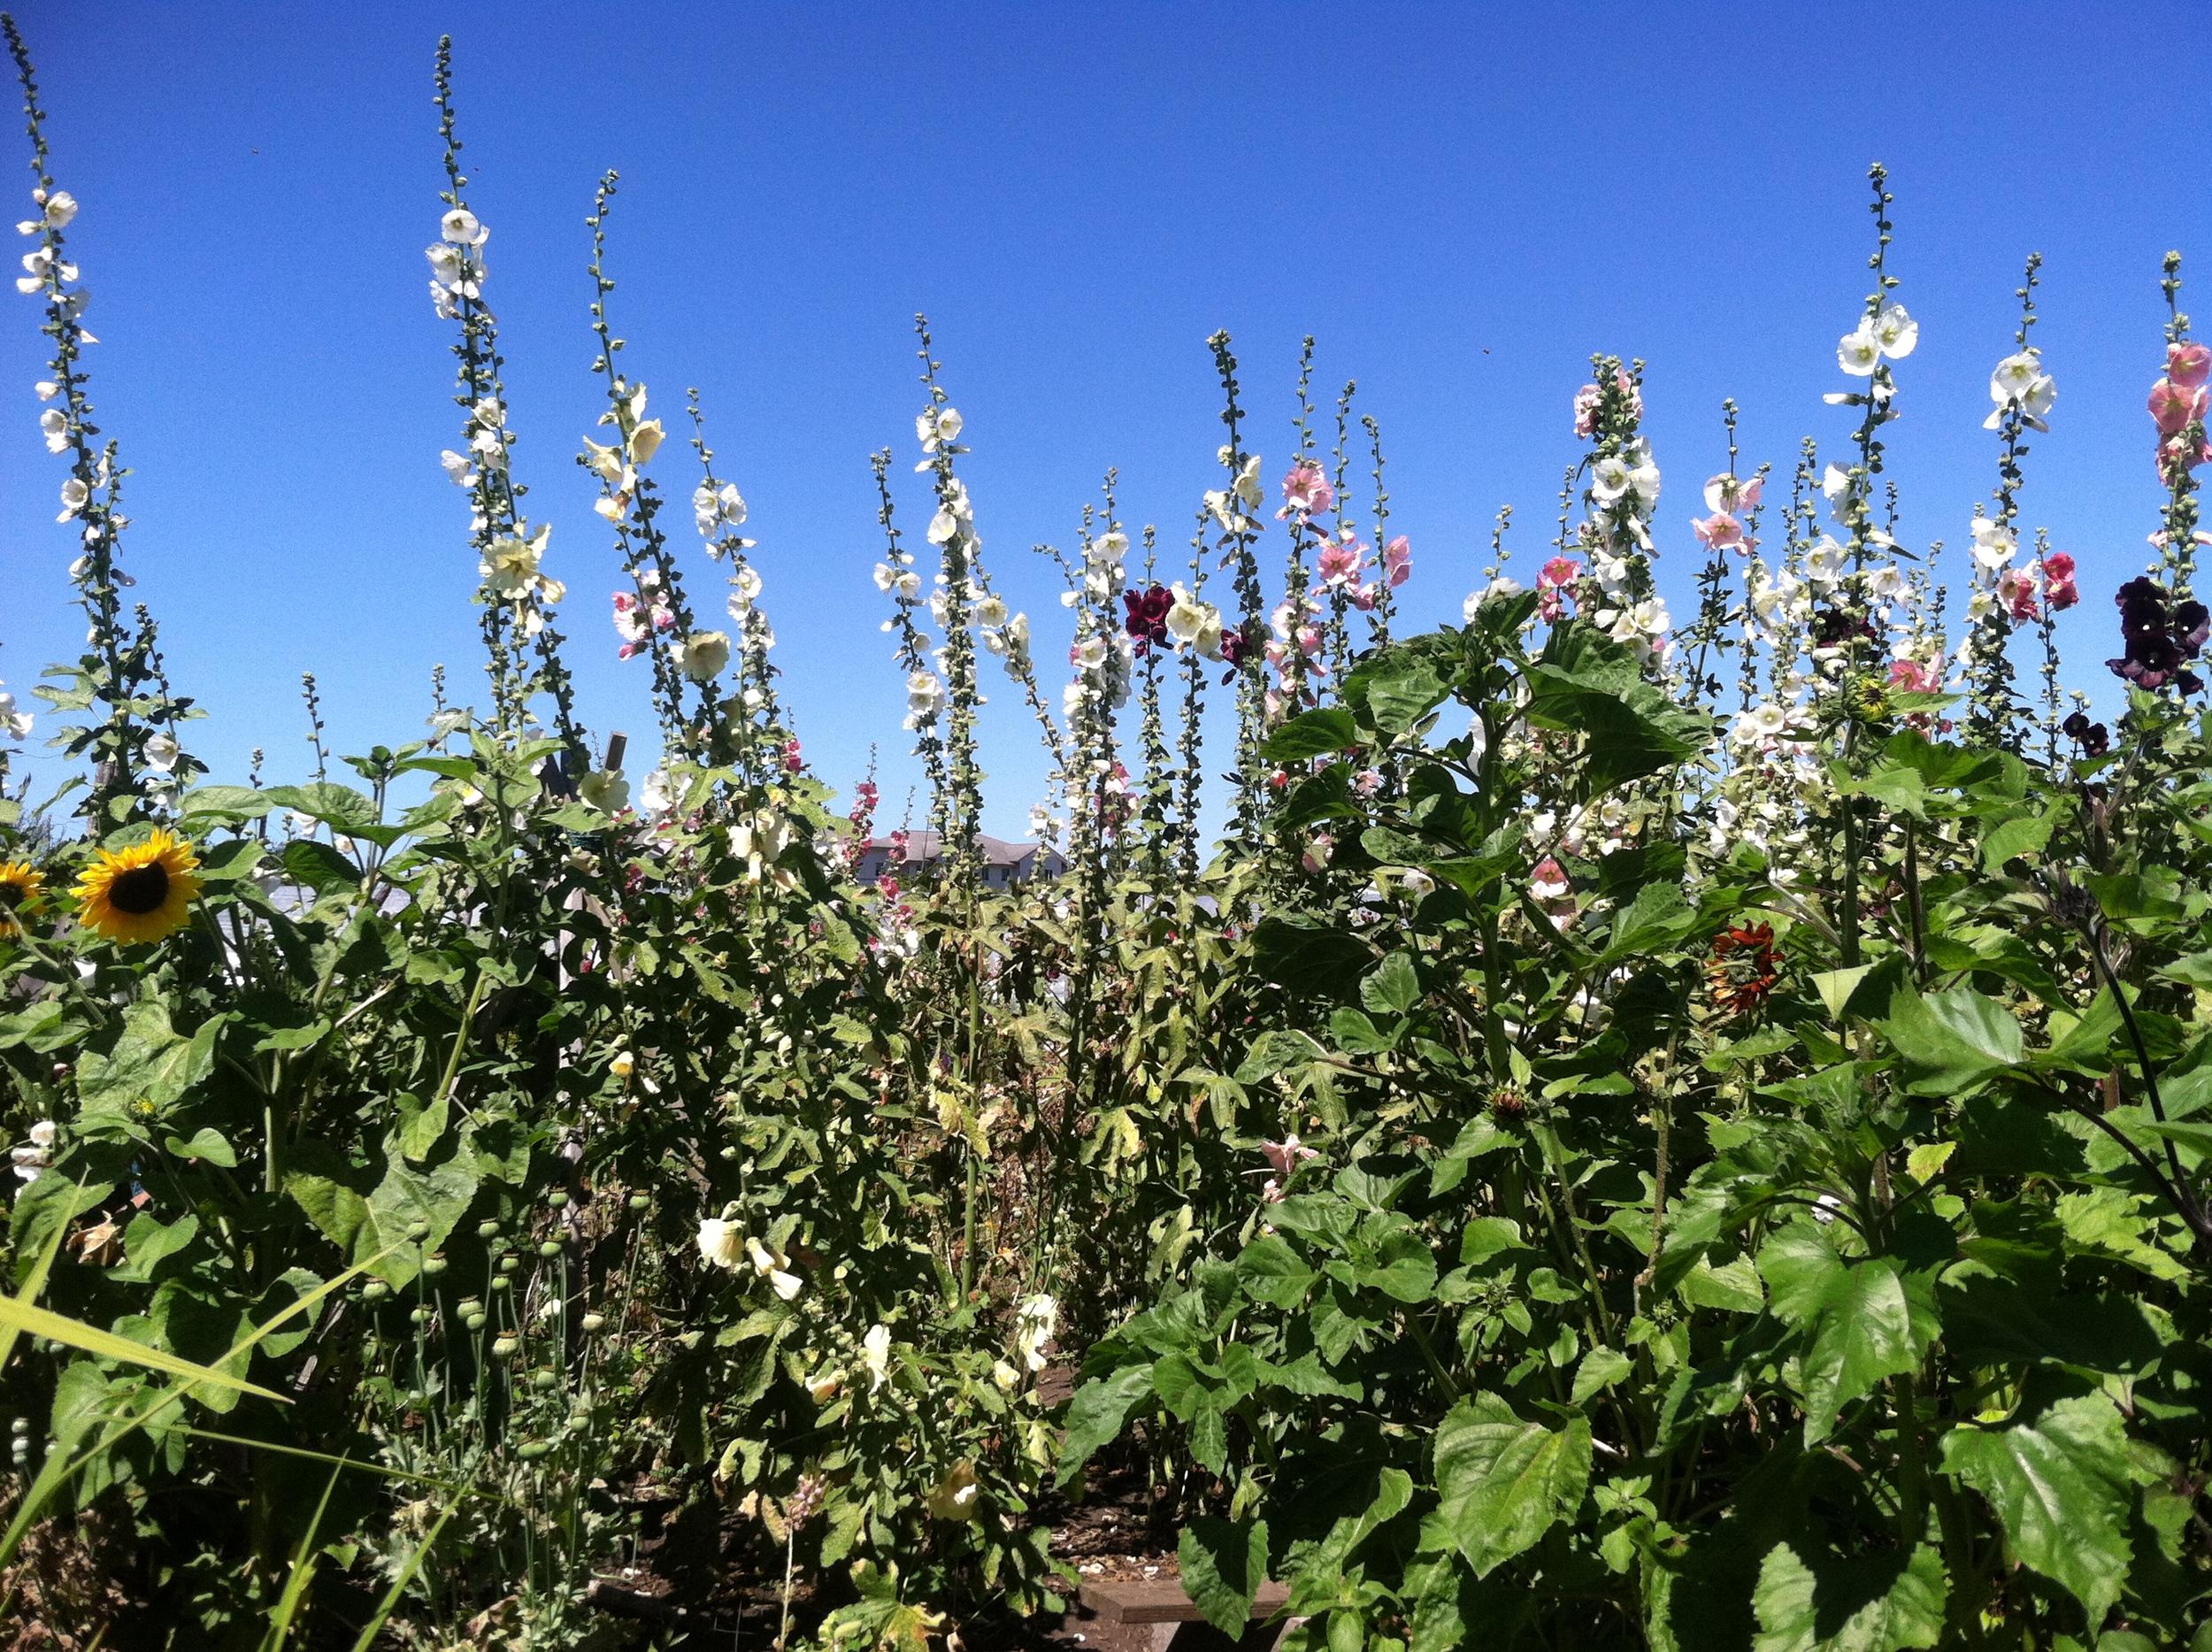 Secret Garden at Colinwoof Farm, Port Townsend WA